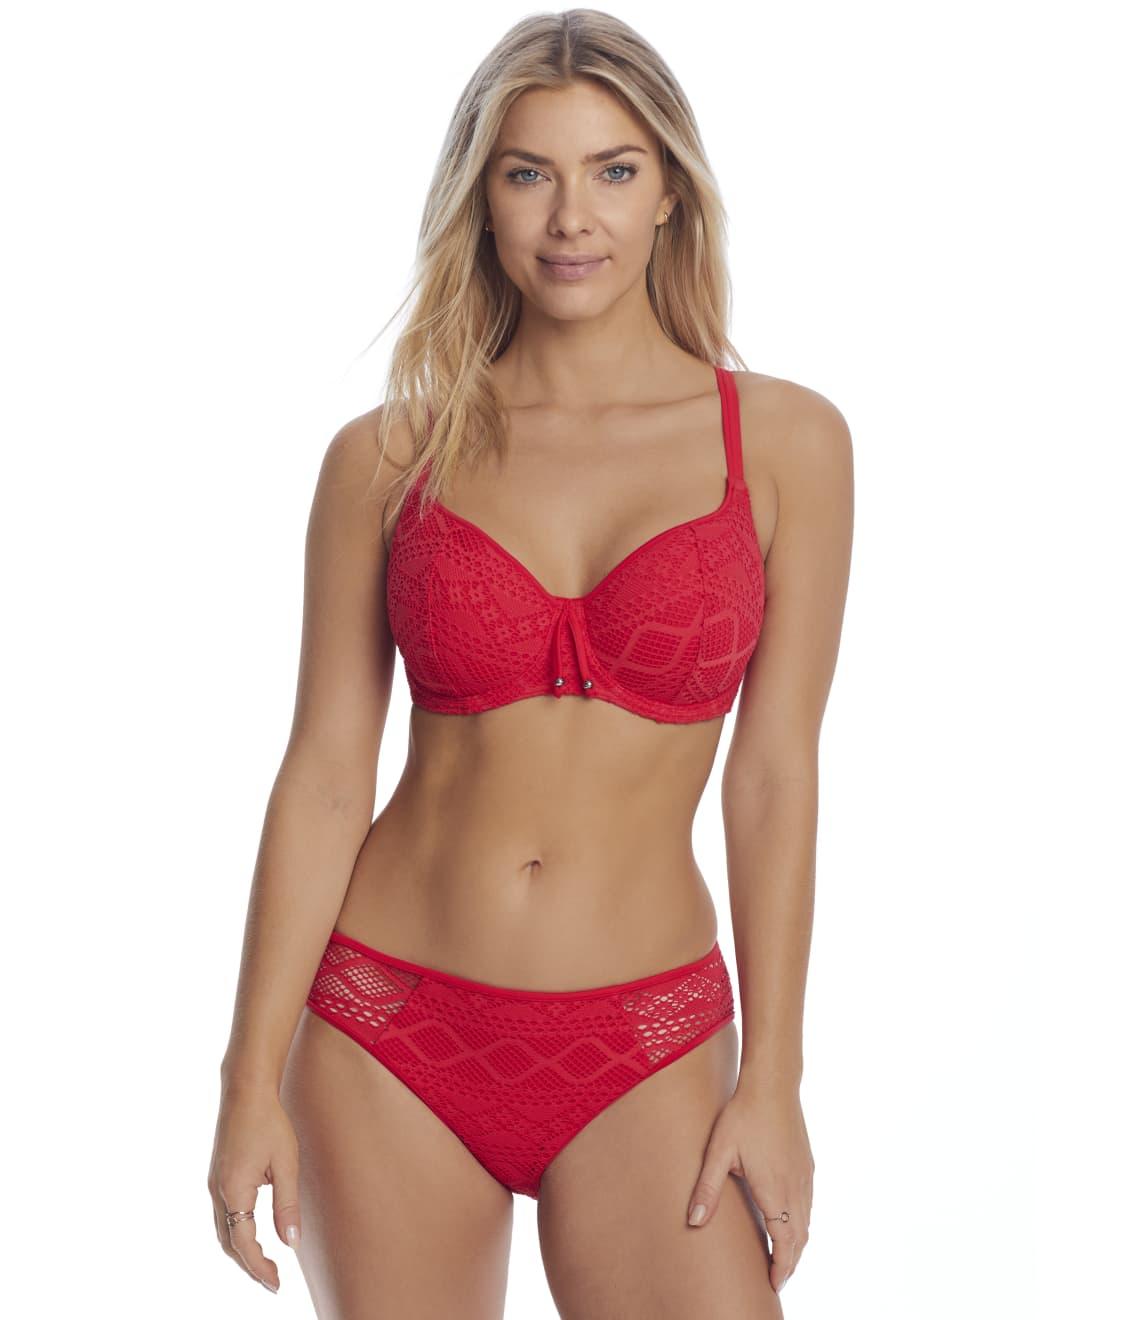 Freya Jewel Cove Bikini Top Sweetheart Padded Plunge UW 7231 Black Various NEW